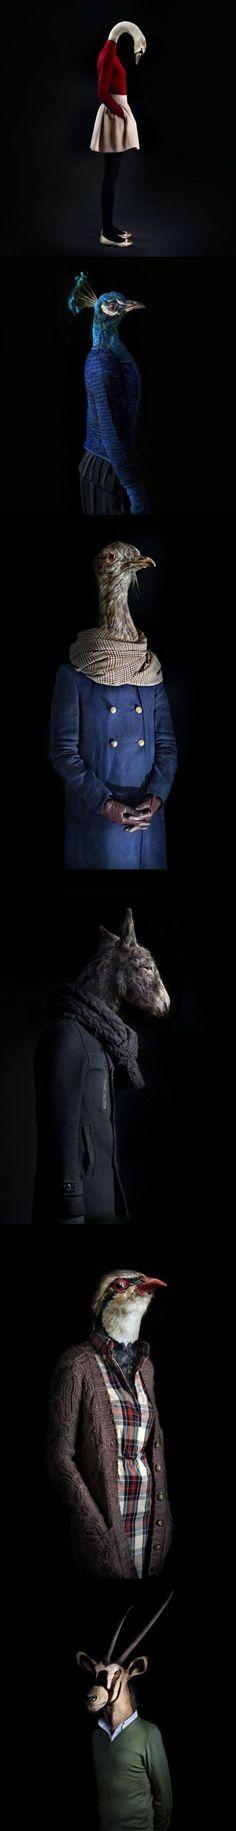 Animal Human Photo manipulations arts